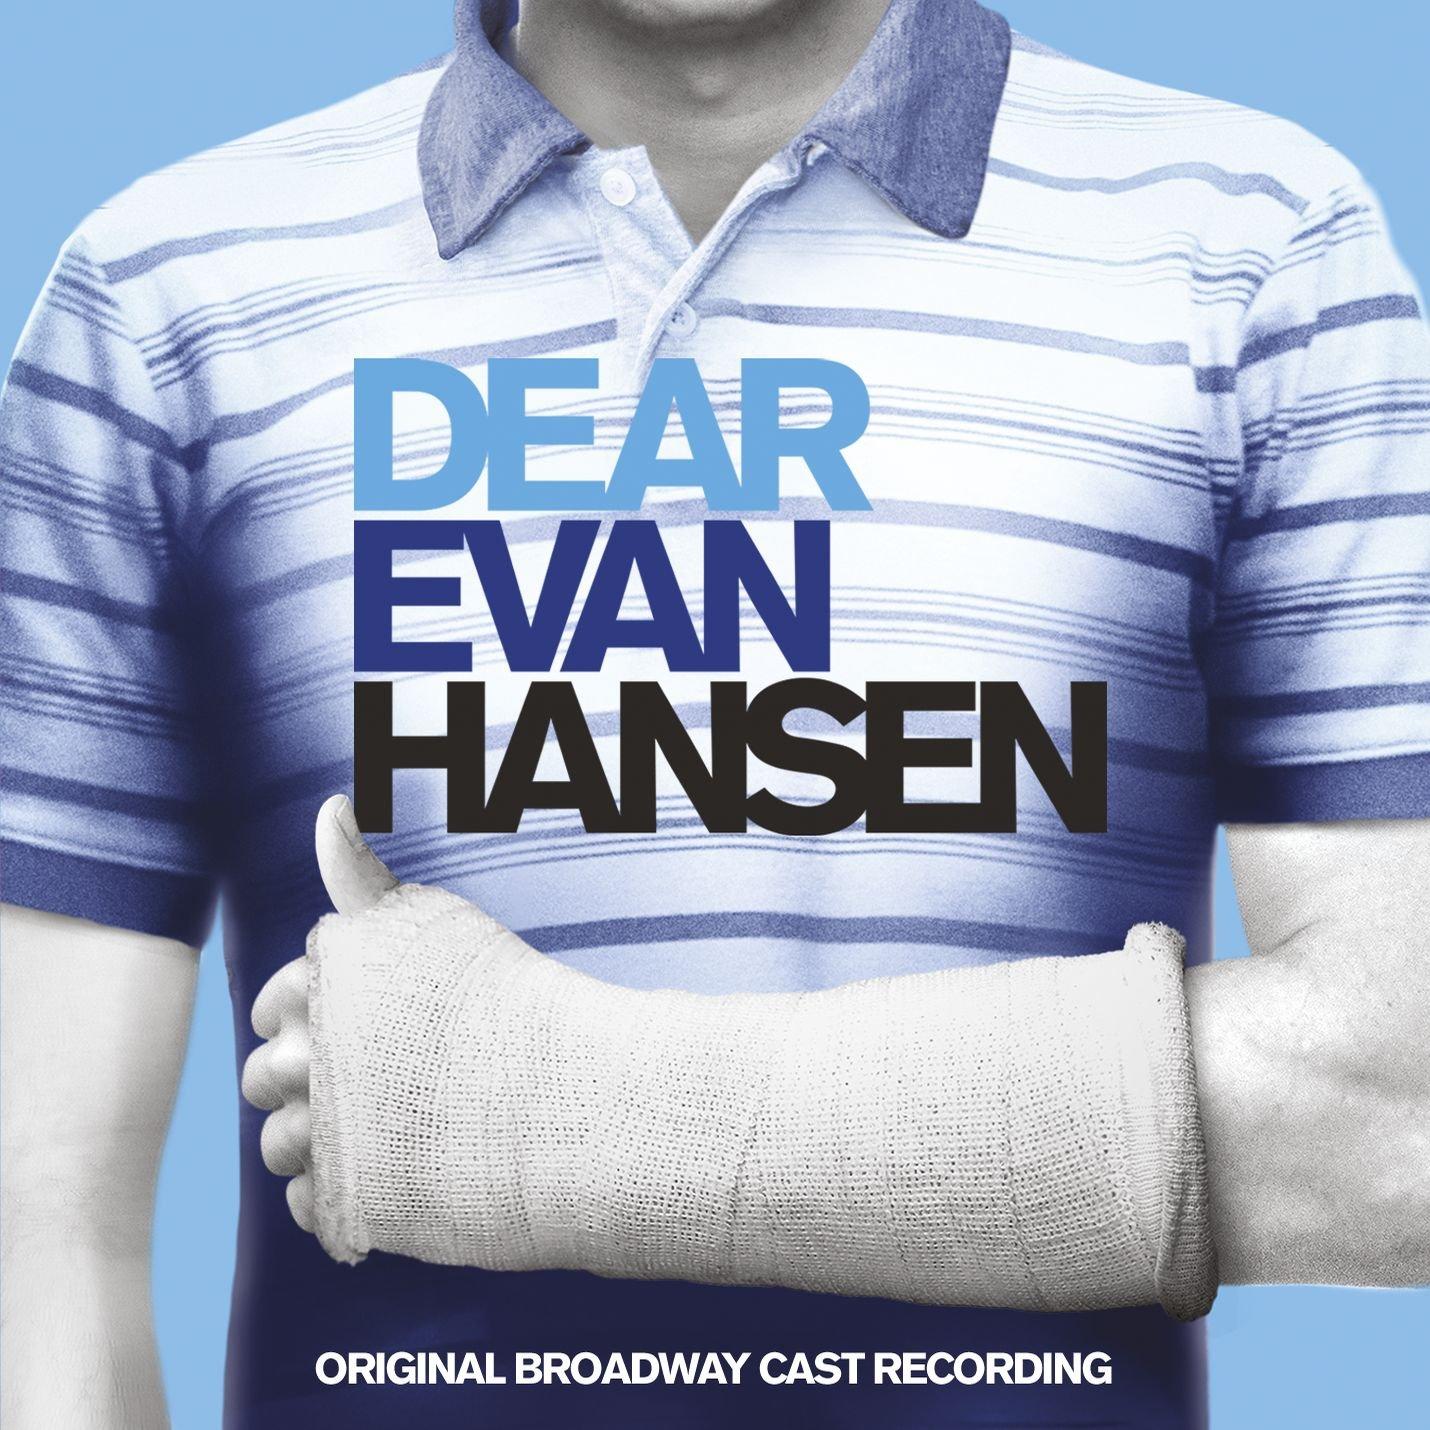 Dear Evan Hansen (Original Broadway Cast) - Dear Evan Hansen (Original  Broadway Cast Recording) - Amazon.com Music 30c811206dfe